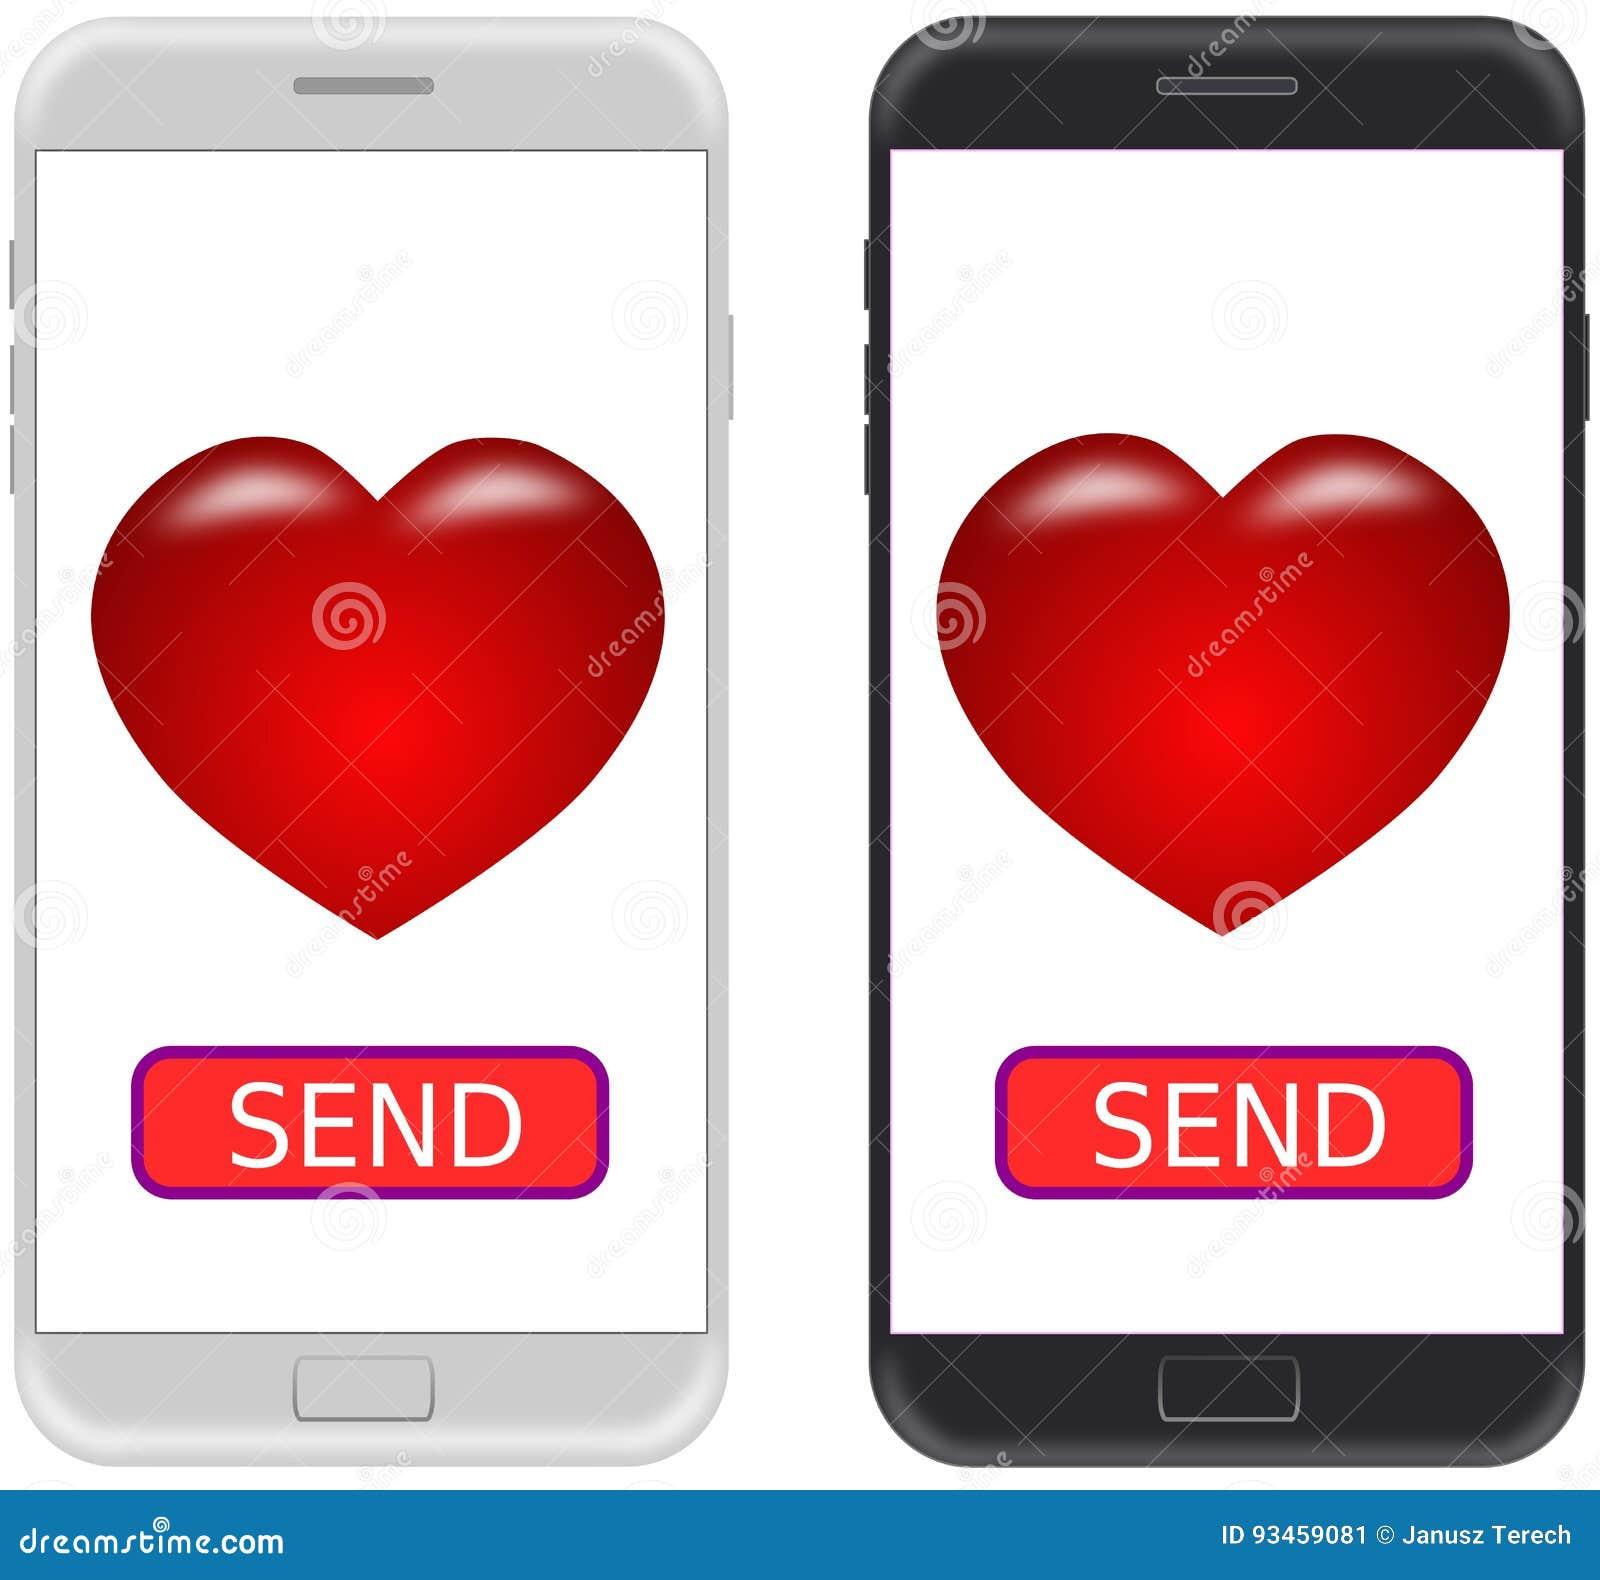 Plastock online dating